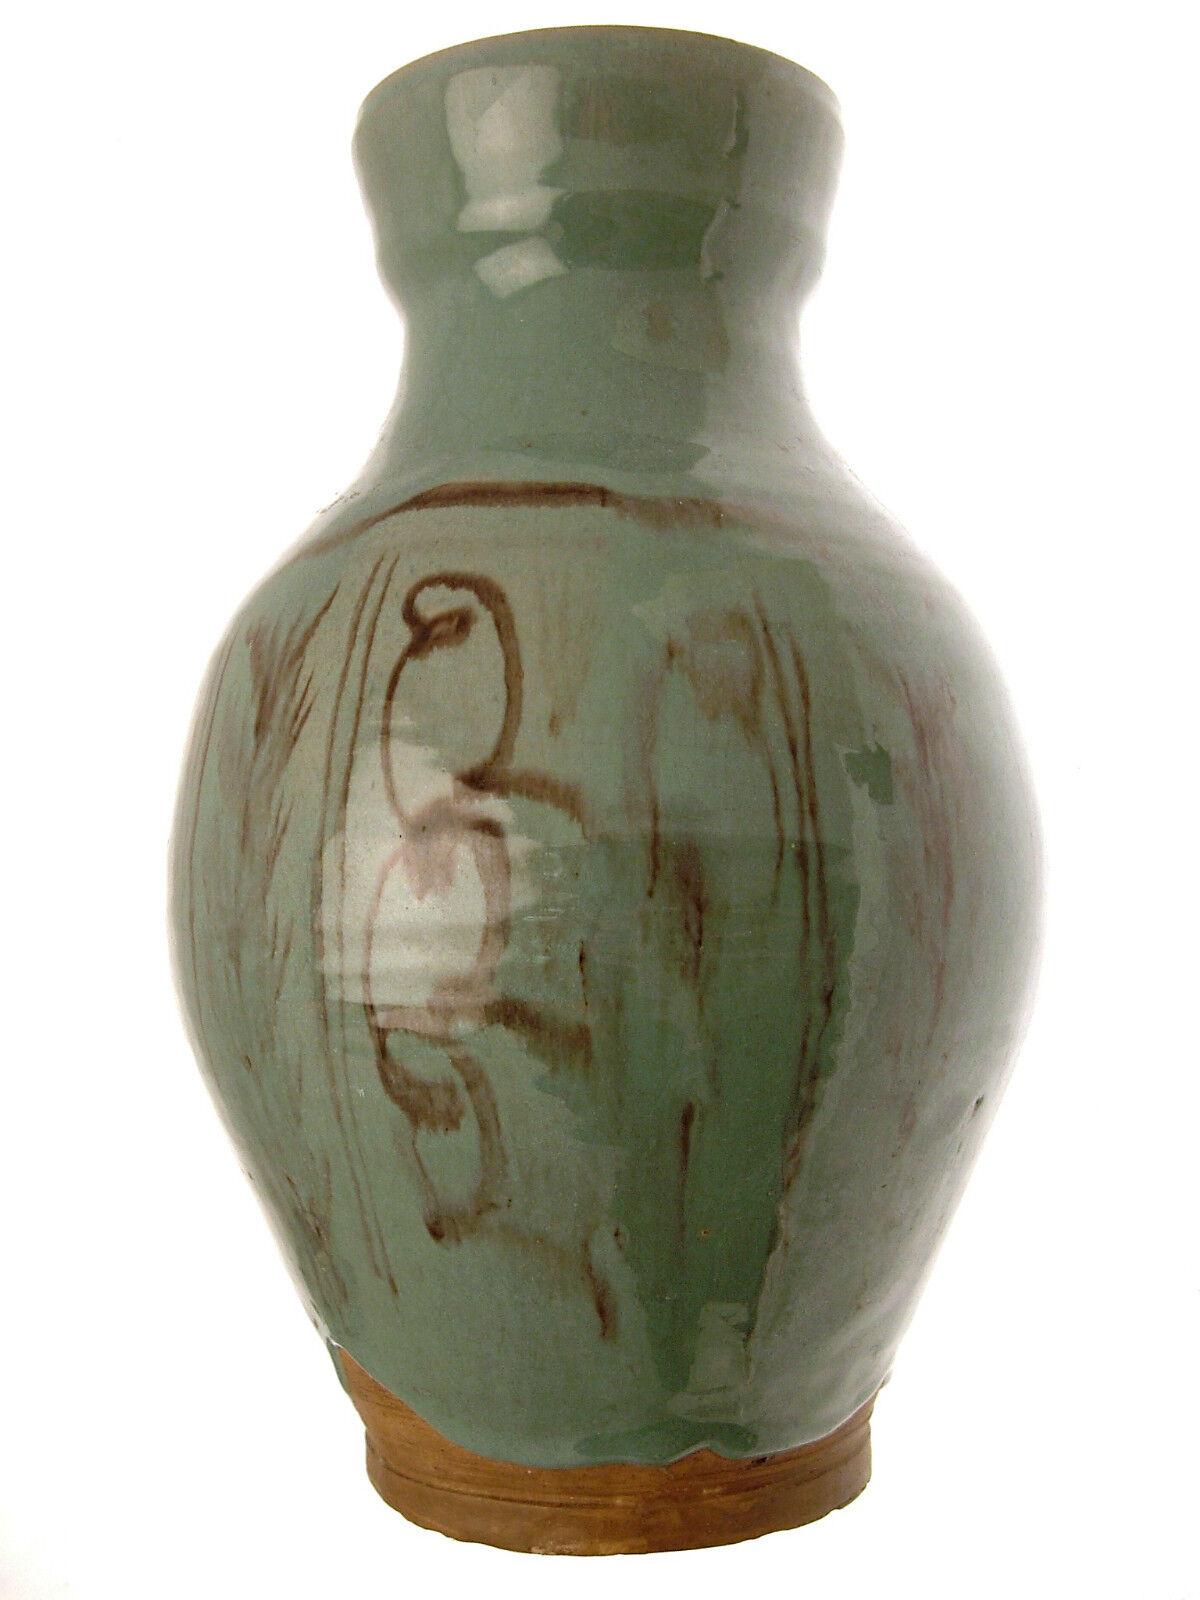 Studio Cerámica regate Esmaltado grandes wjm arte florero de cerámica